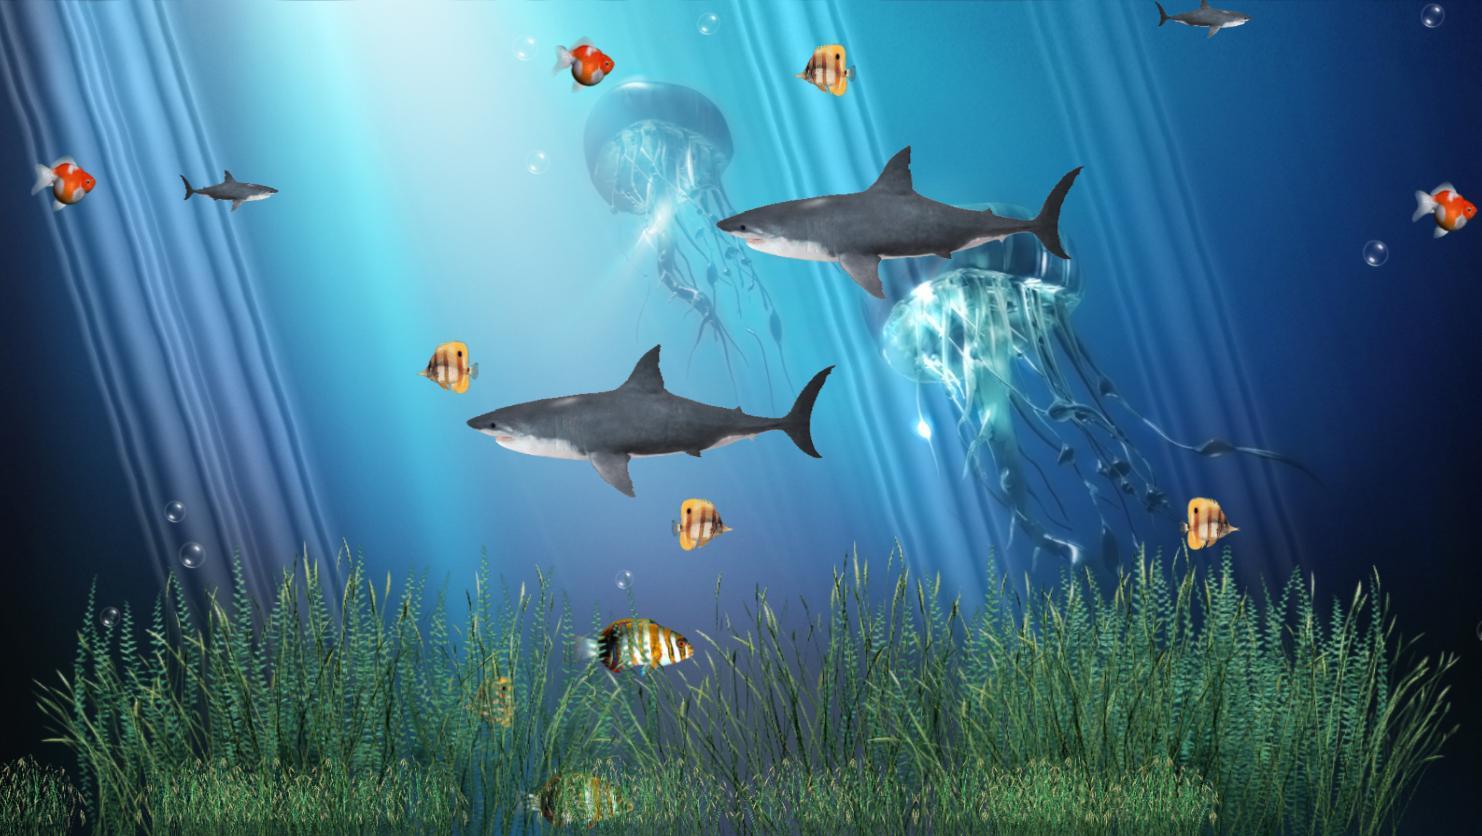 Fish aquarium wallpaper free download - Download Coral Reef Aquarium Animated Wallpaper